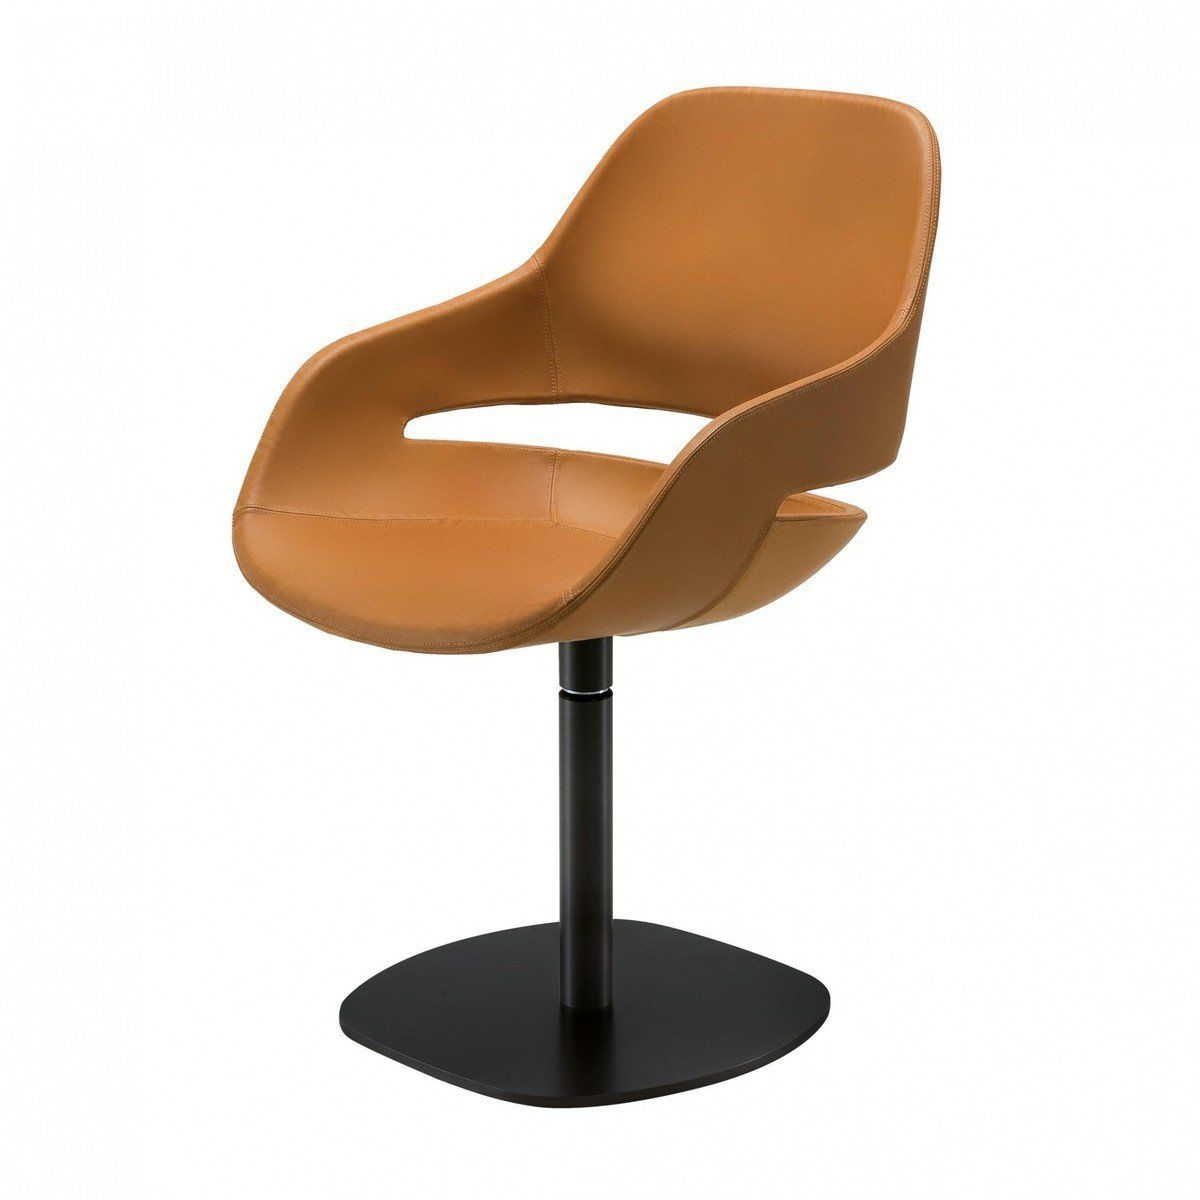 eva swivel chair zanotta. Black Bedroom Furniture Sets. Home Design Ideas